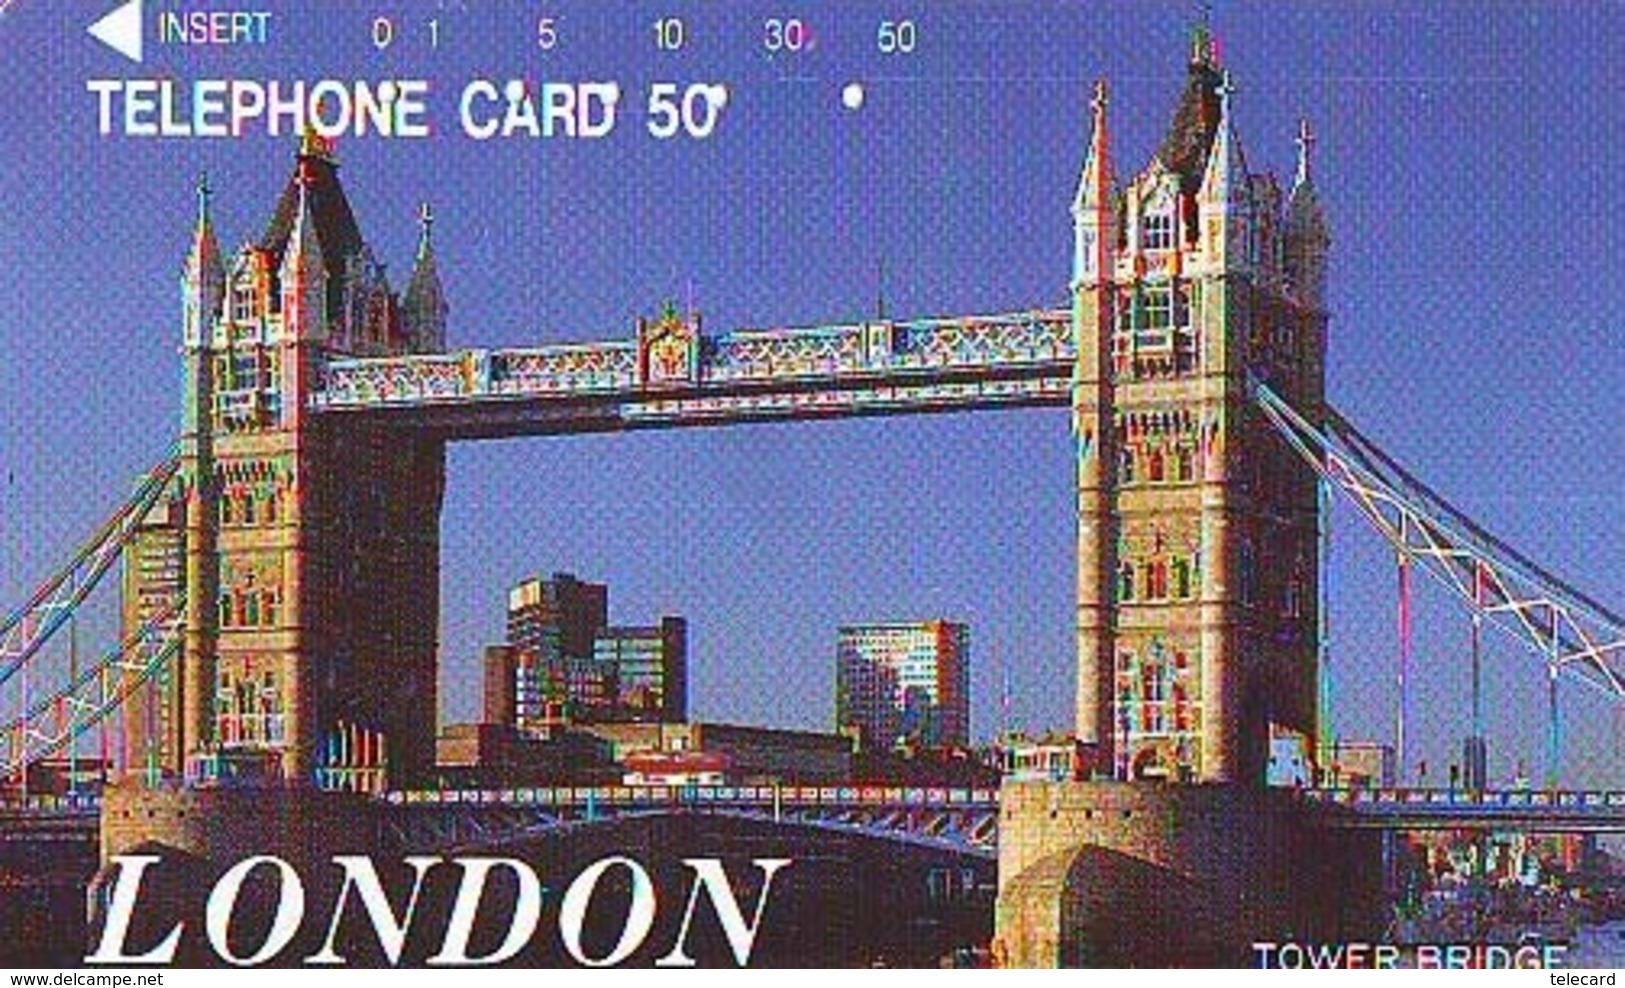 Télécarte Japon ANGLETERRE (303) GREAT BRITAIN Related * ENGLAND Phonecard Japan * TOWER BRIDGE * LONDON - Paisajes